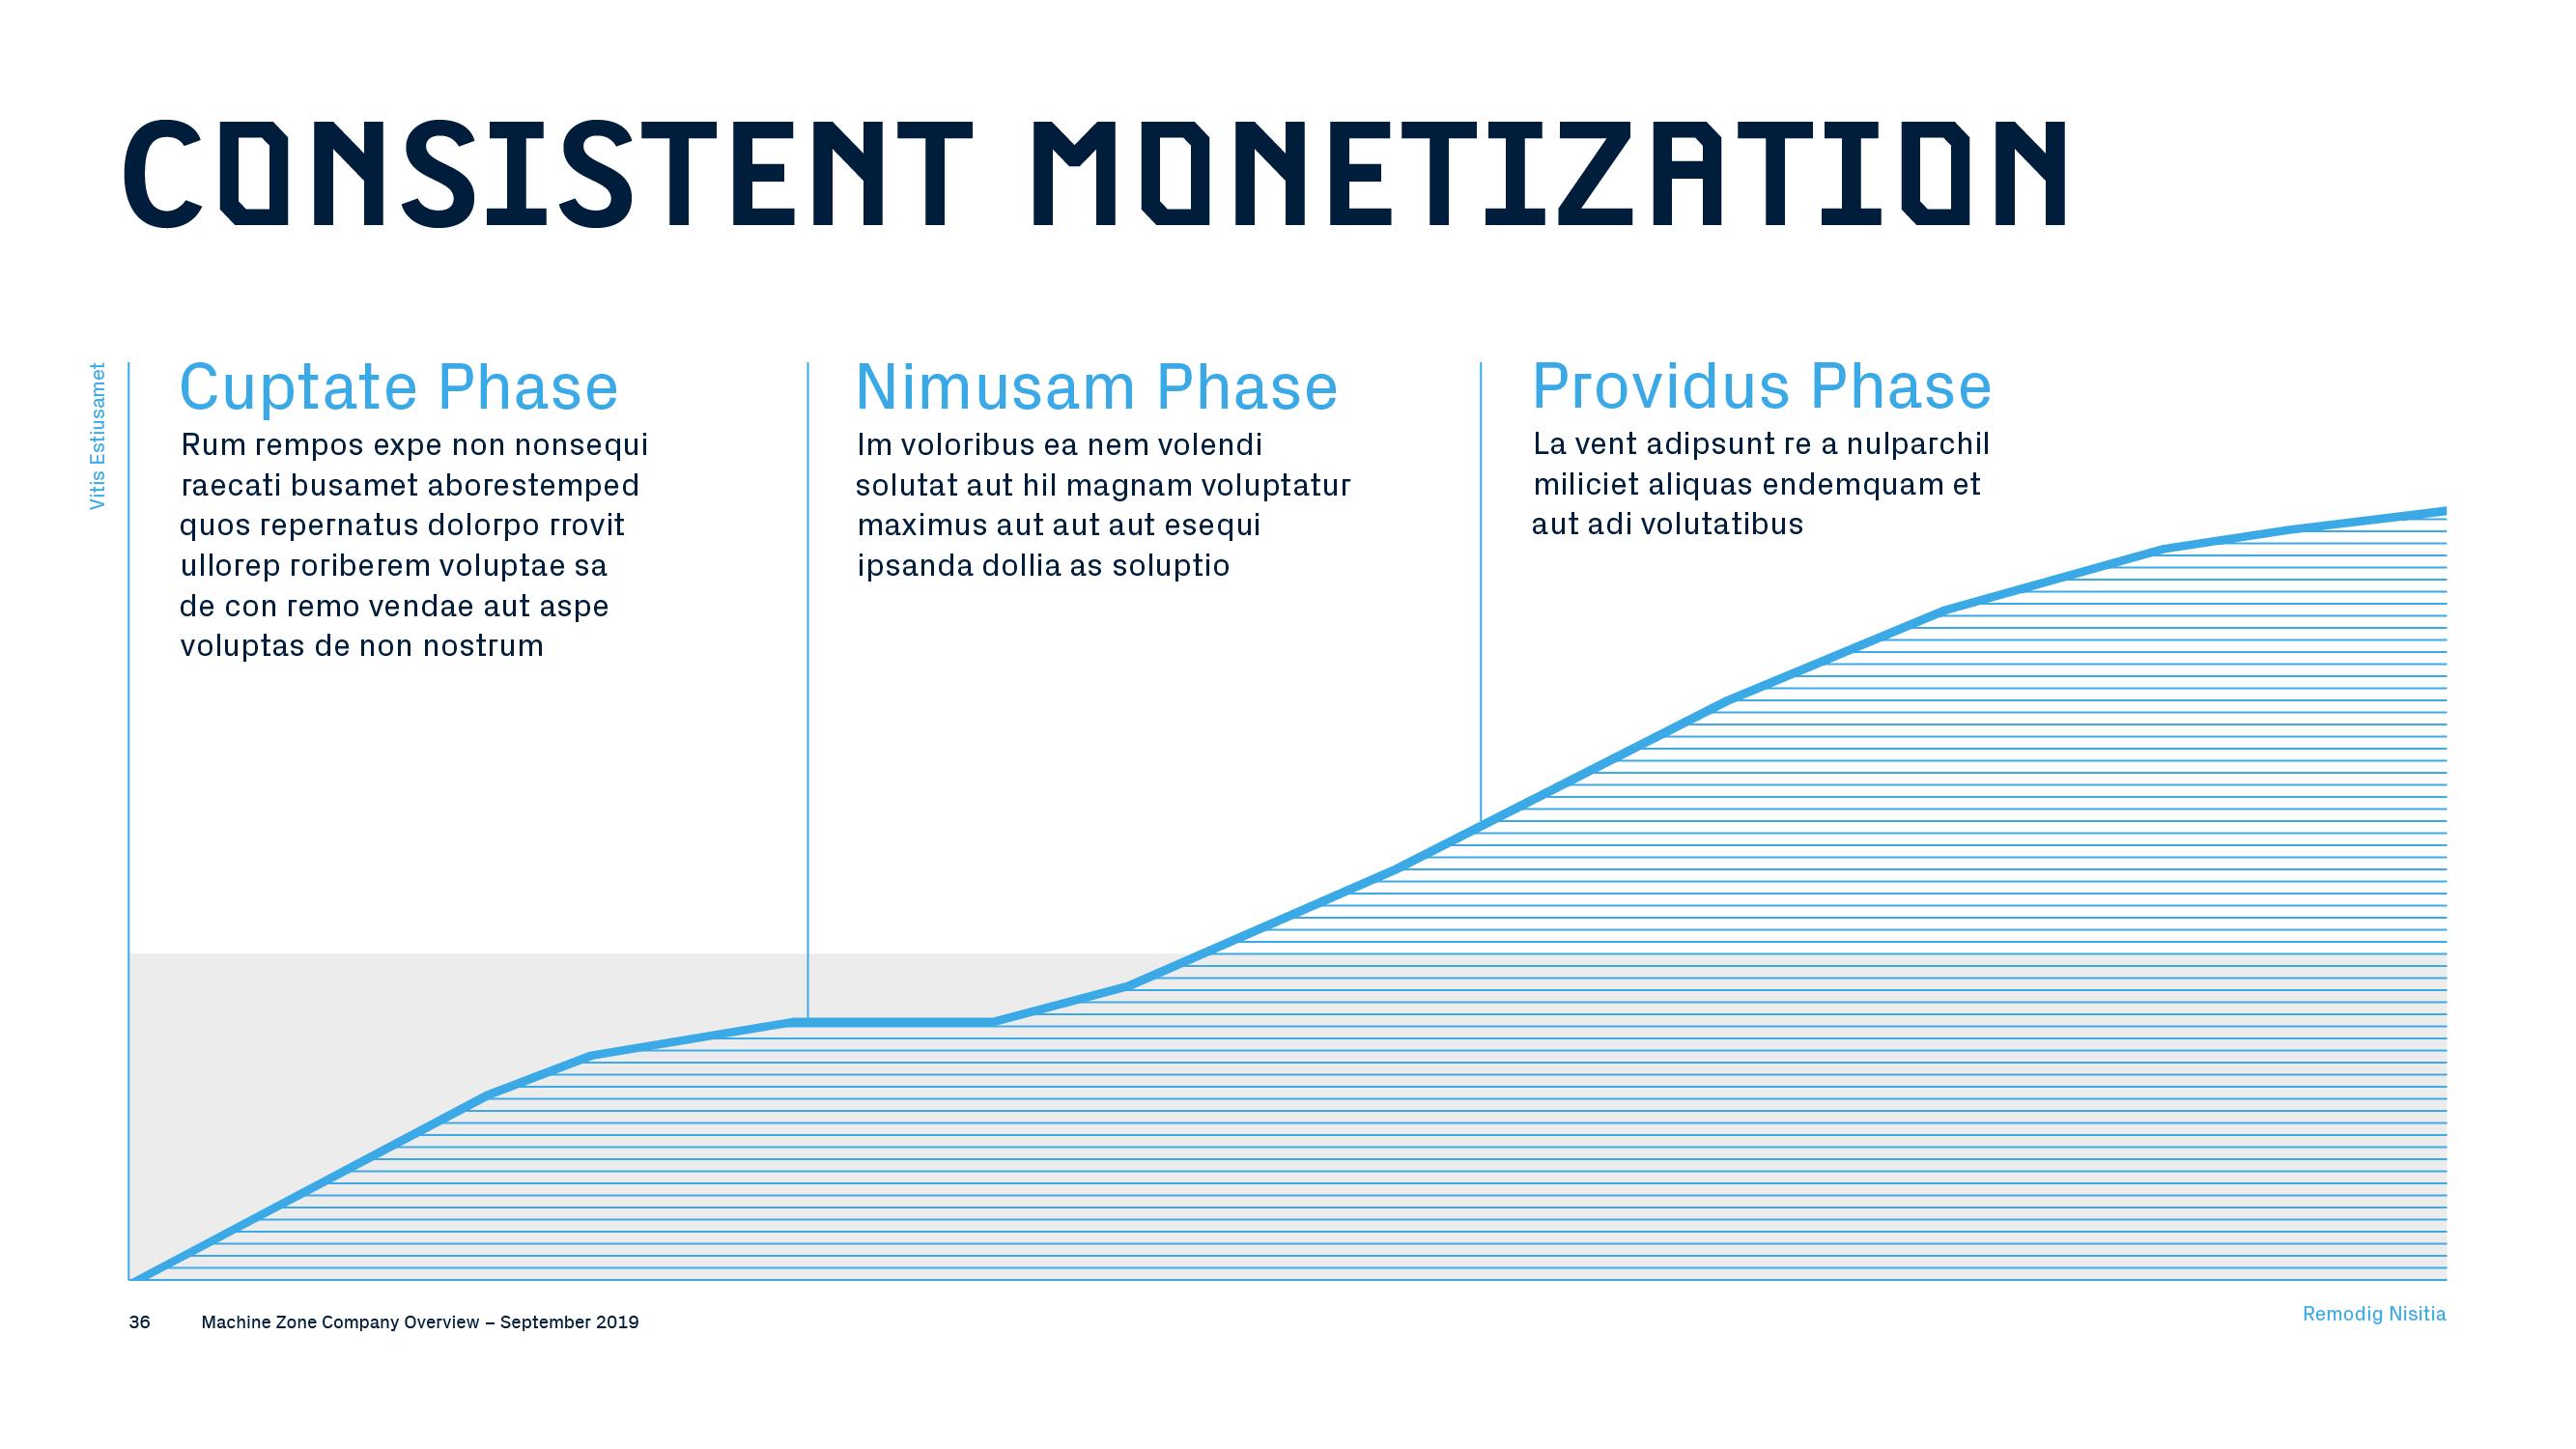 Machine Zone monetization